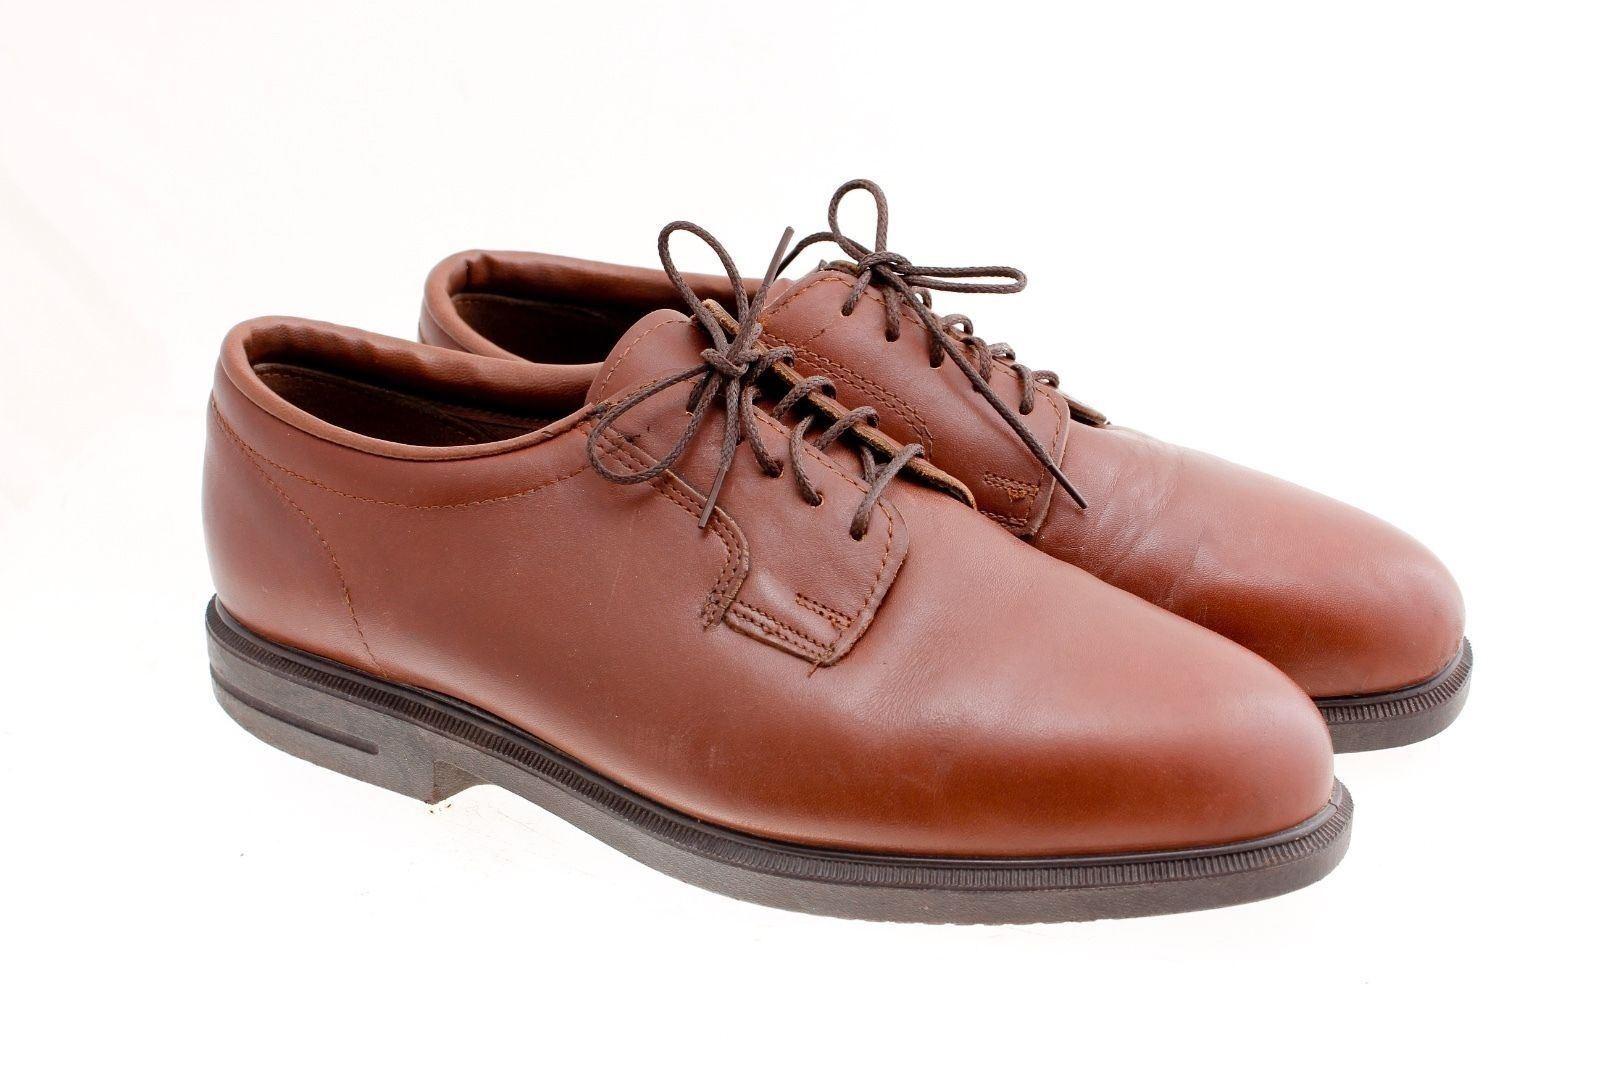 All American Chaussure styles marron Oxford No Slip 10.5 en cuir